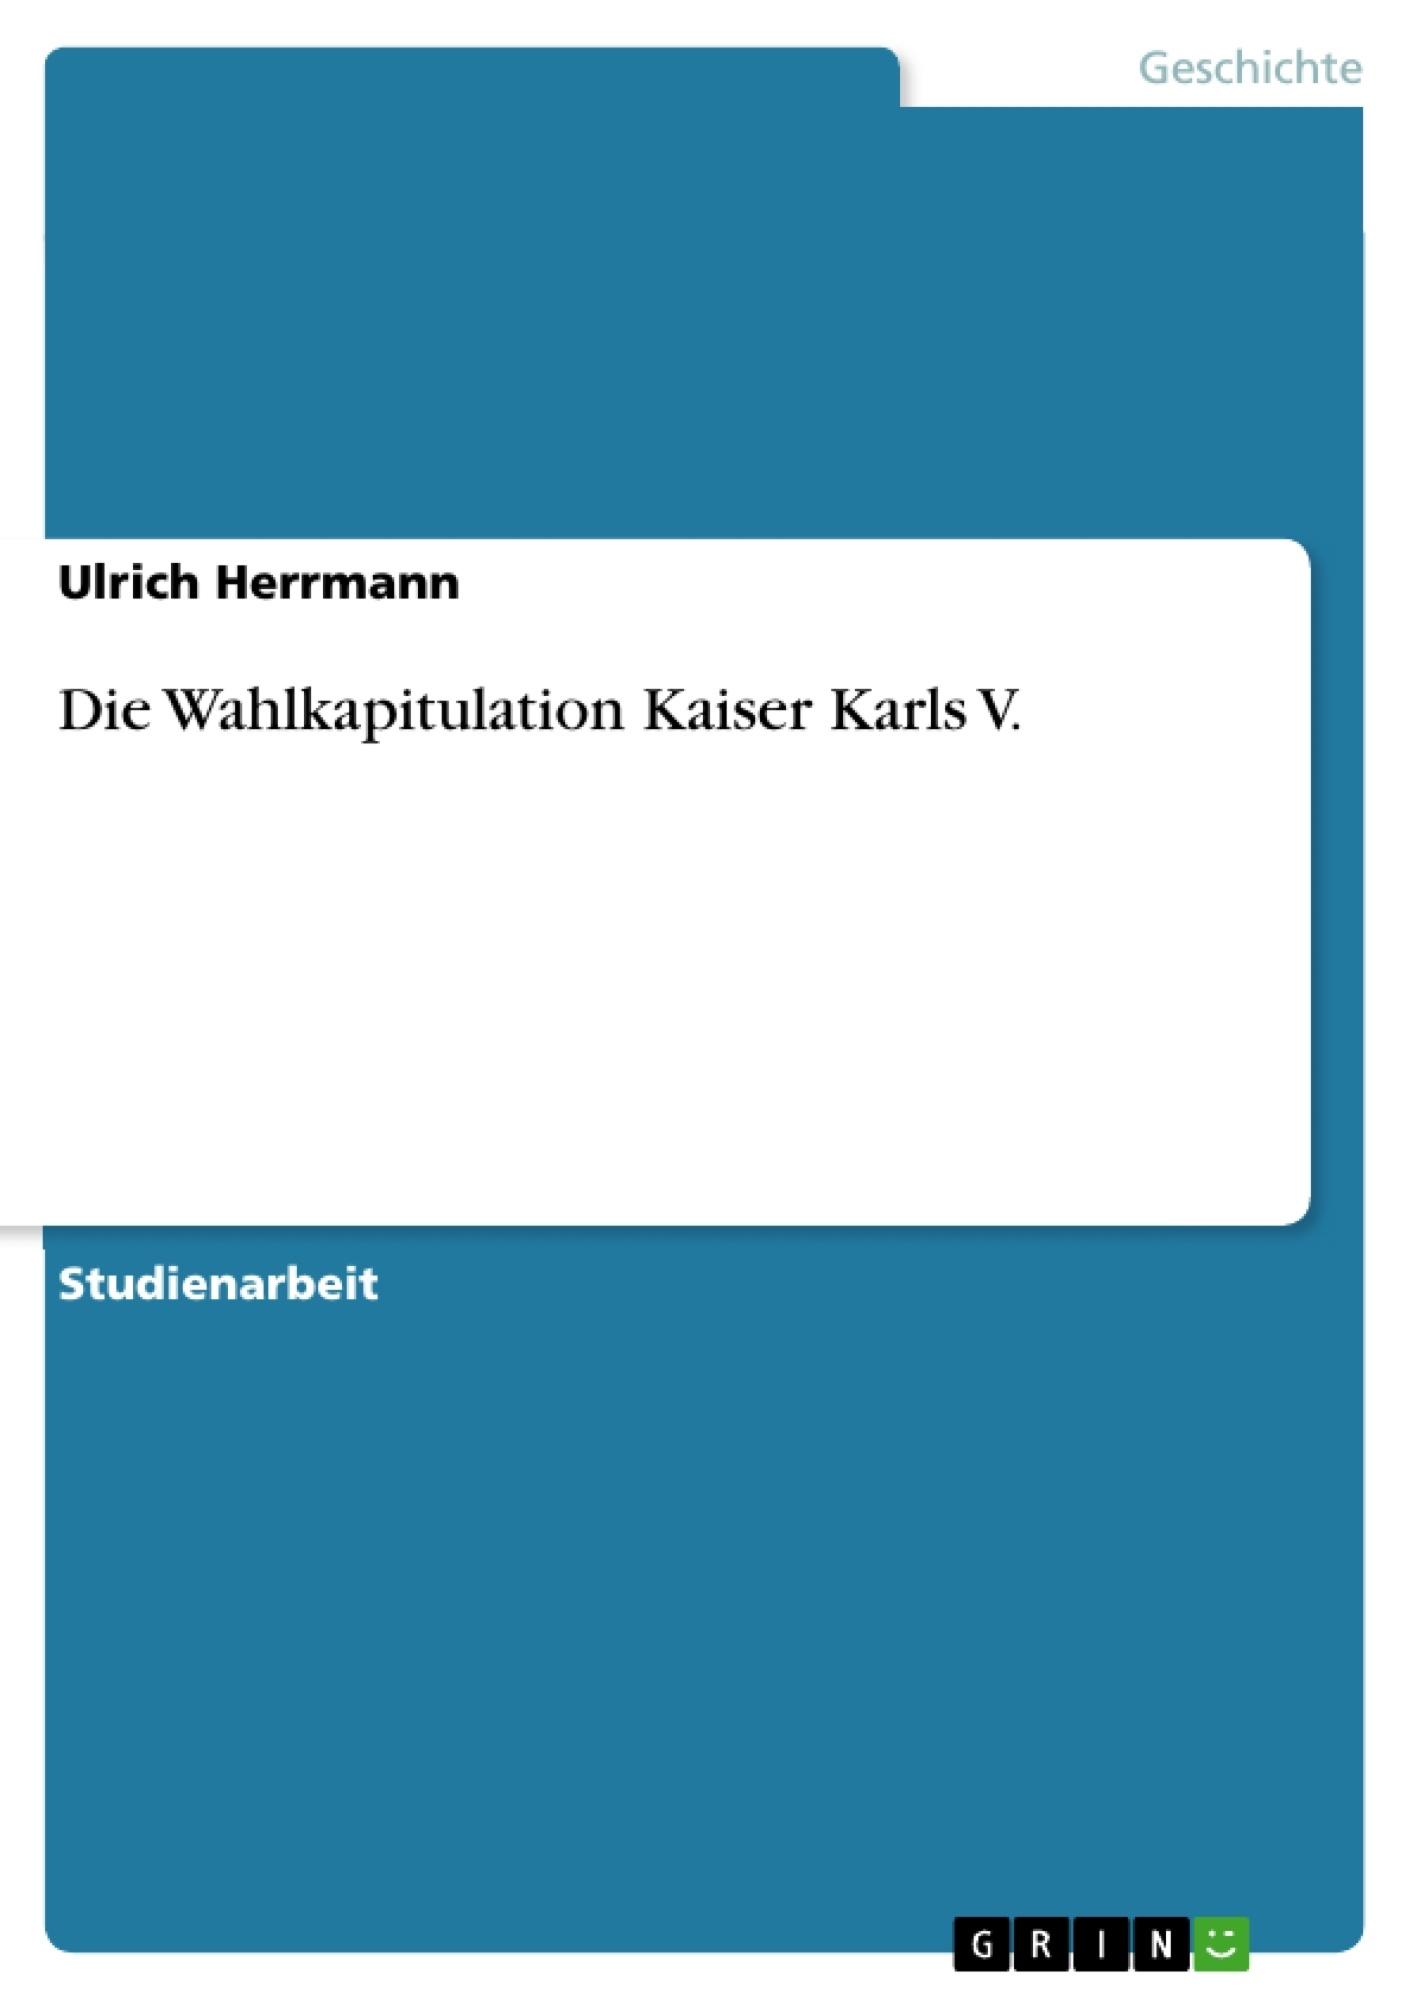 Titel: Die Wahlkapitulation Kaiser Karls V.